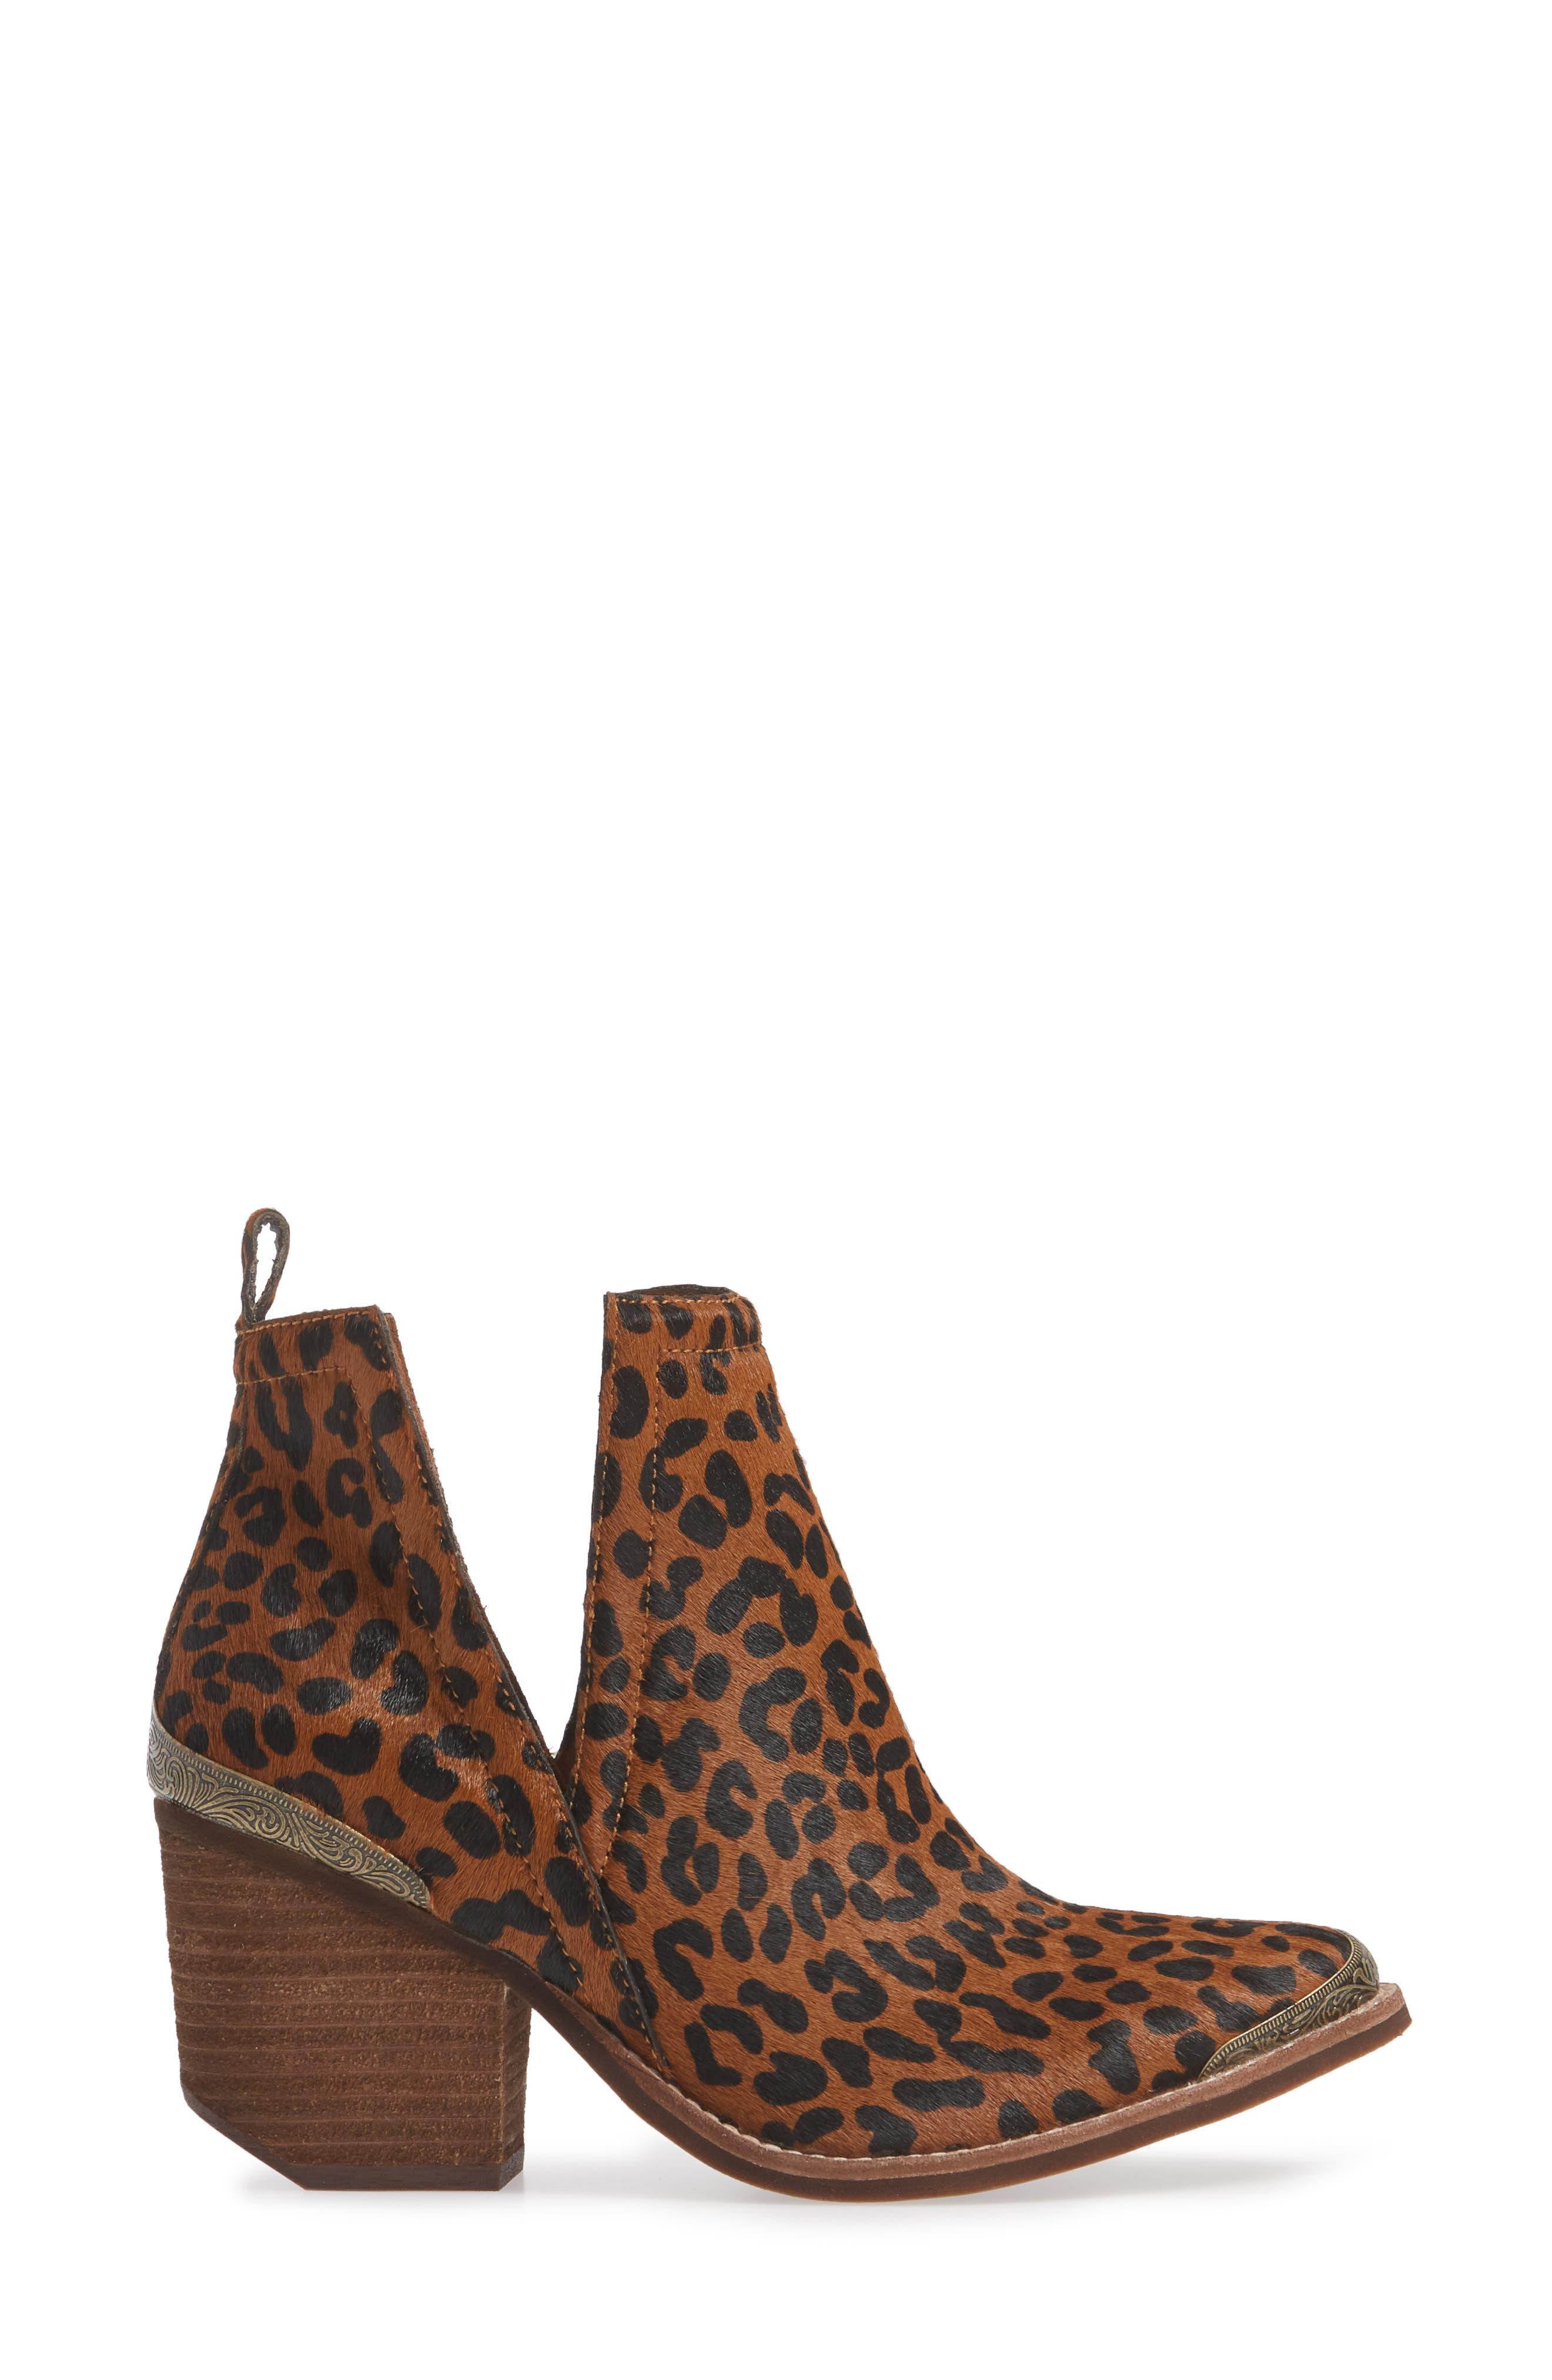 JEFFREY CAMPBELL, Cromwell Cutout Genuine Calf Hair Western Boot, Alternate thumbnail 3, color, BROWN CHEETAH CALF HAIR